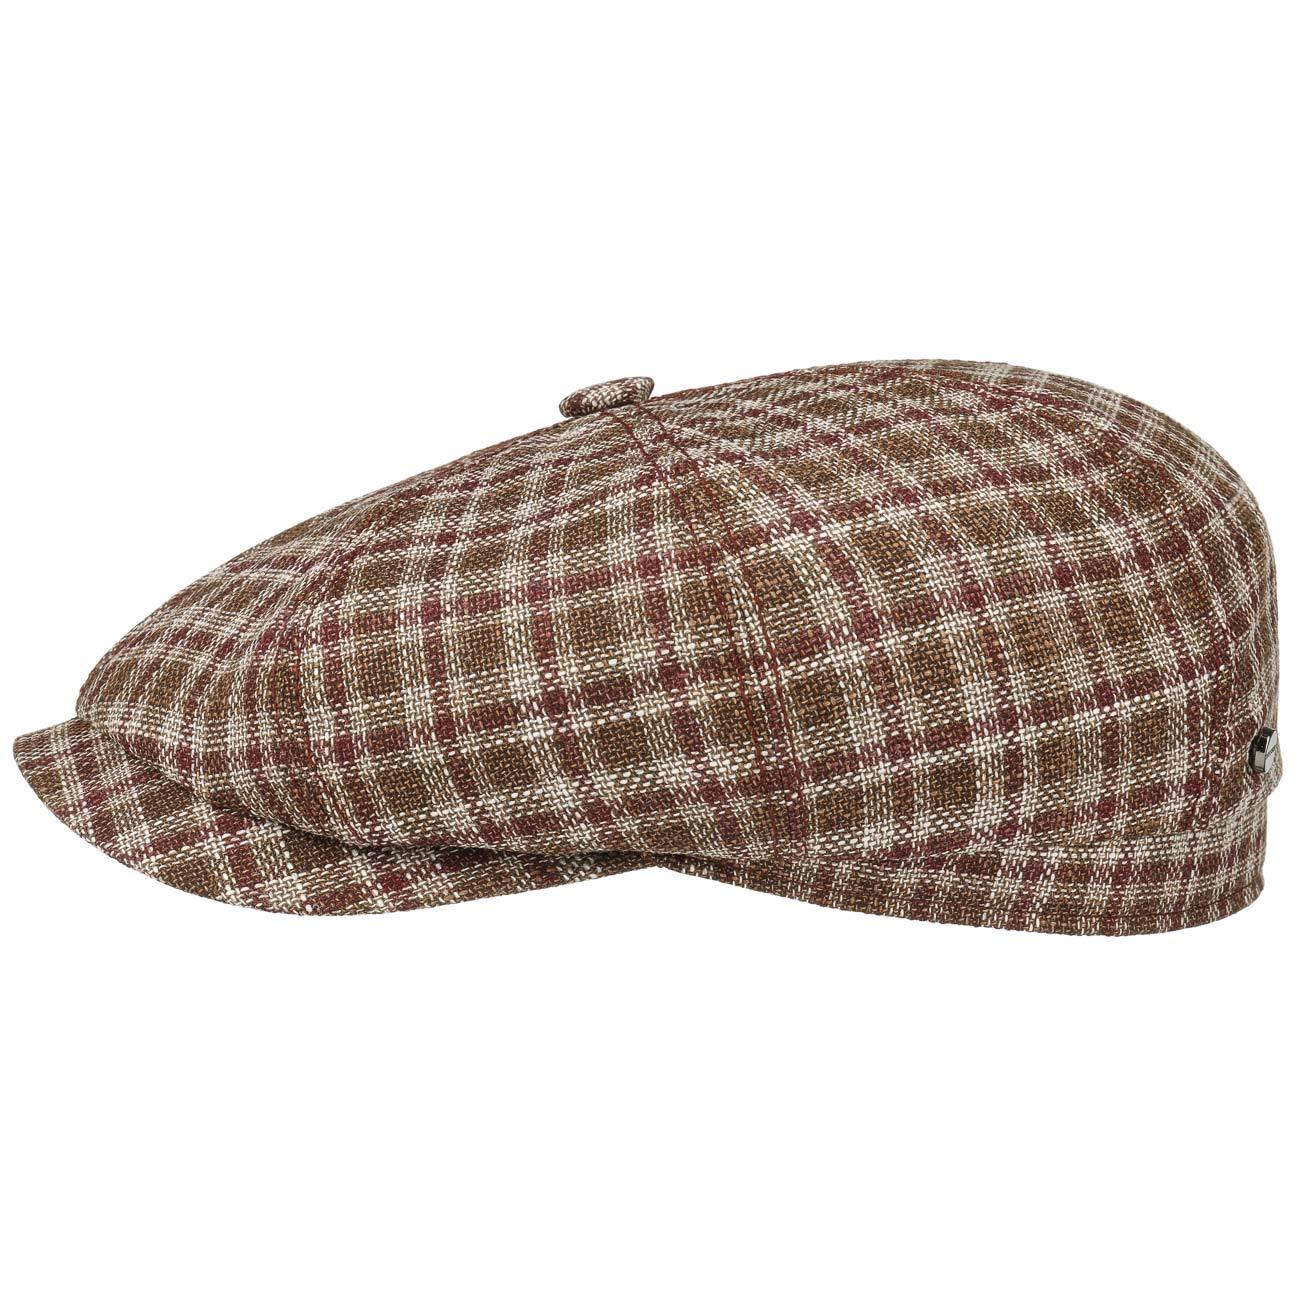 3bb6fd716 Stetson Hatteras Cerruti Quadri Flat Cap Men | Made in Germany Wool ...